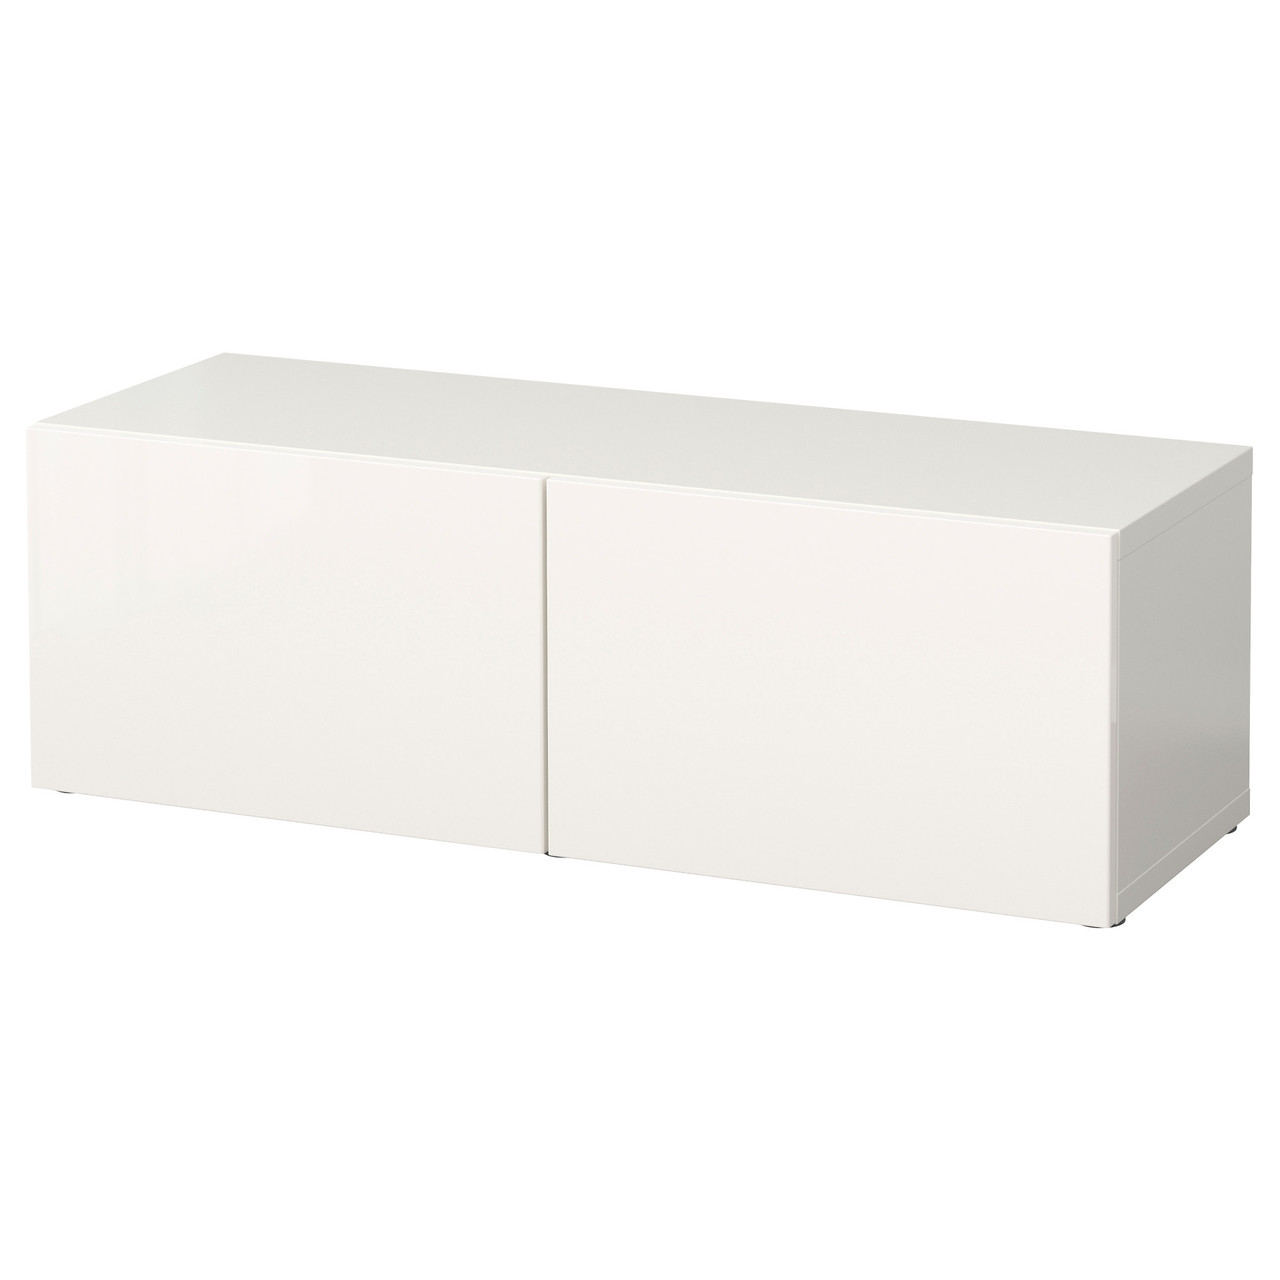 BESTÅ Шкаф с дверью, белый, Selsviken блеск/белый 890.474.43